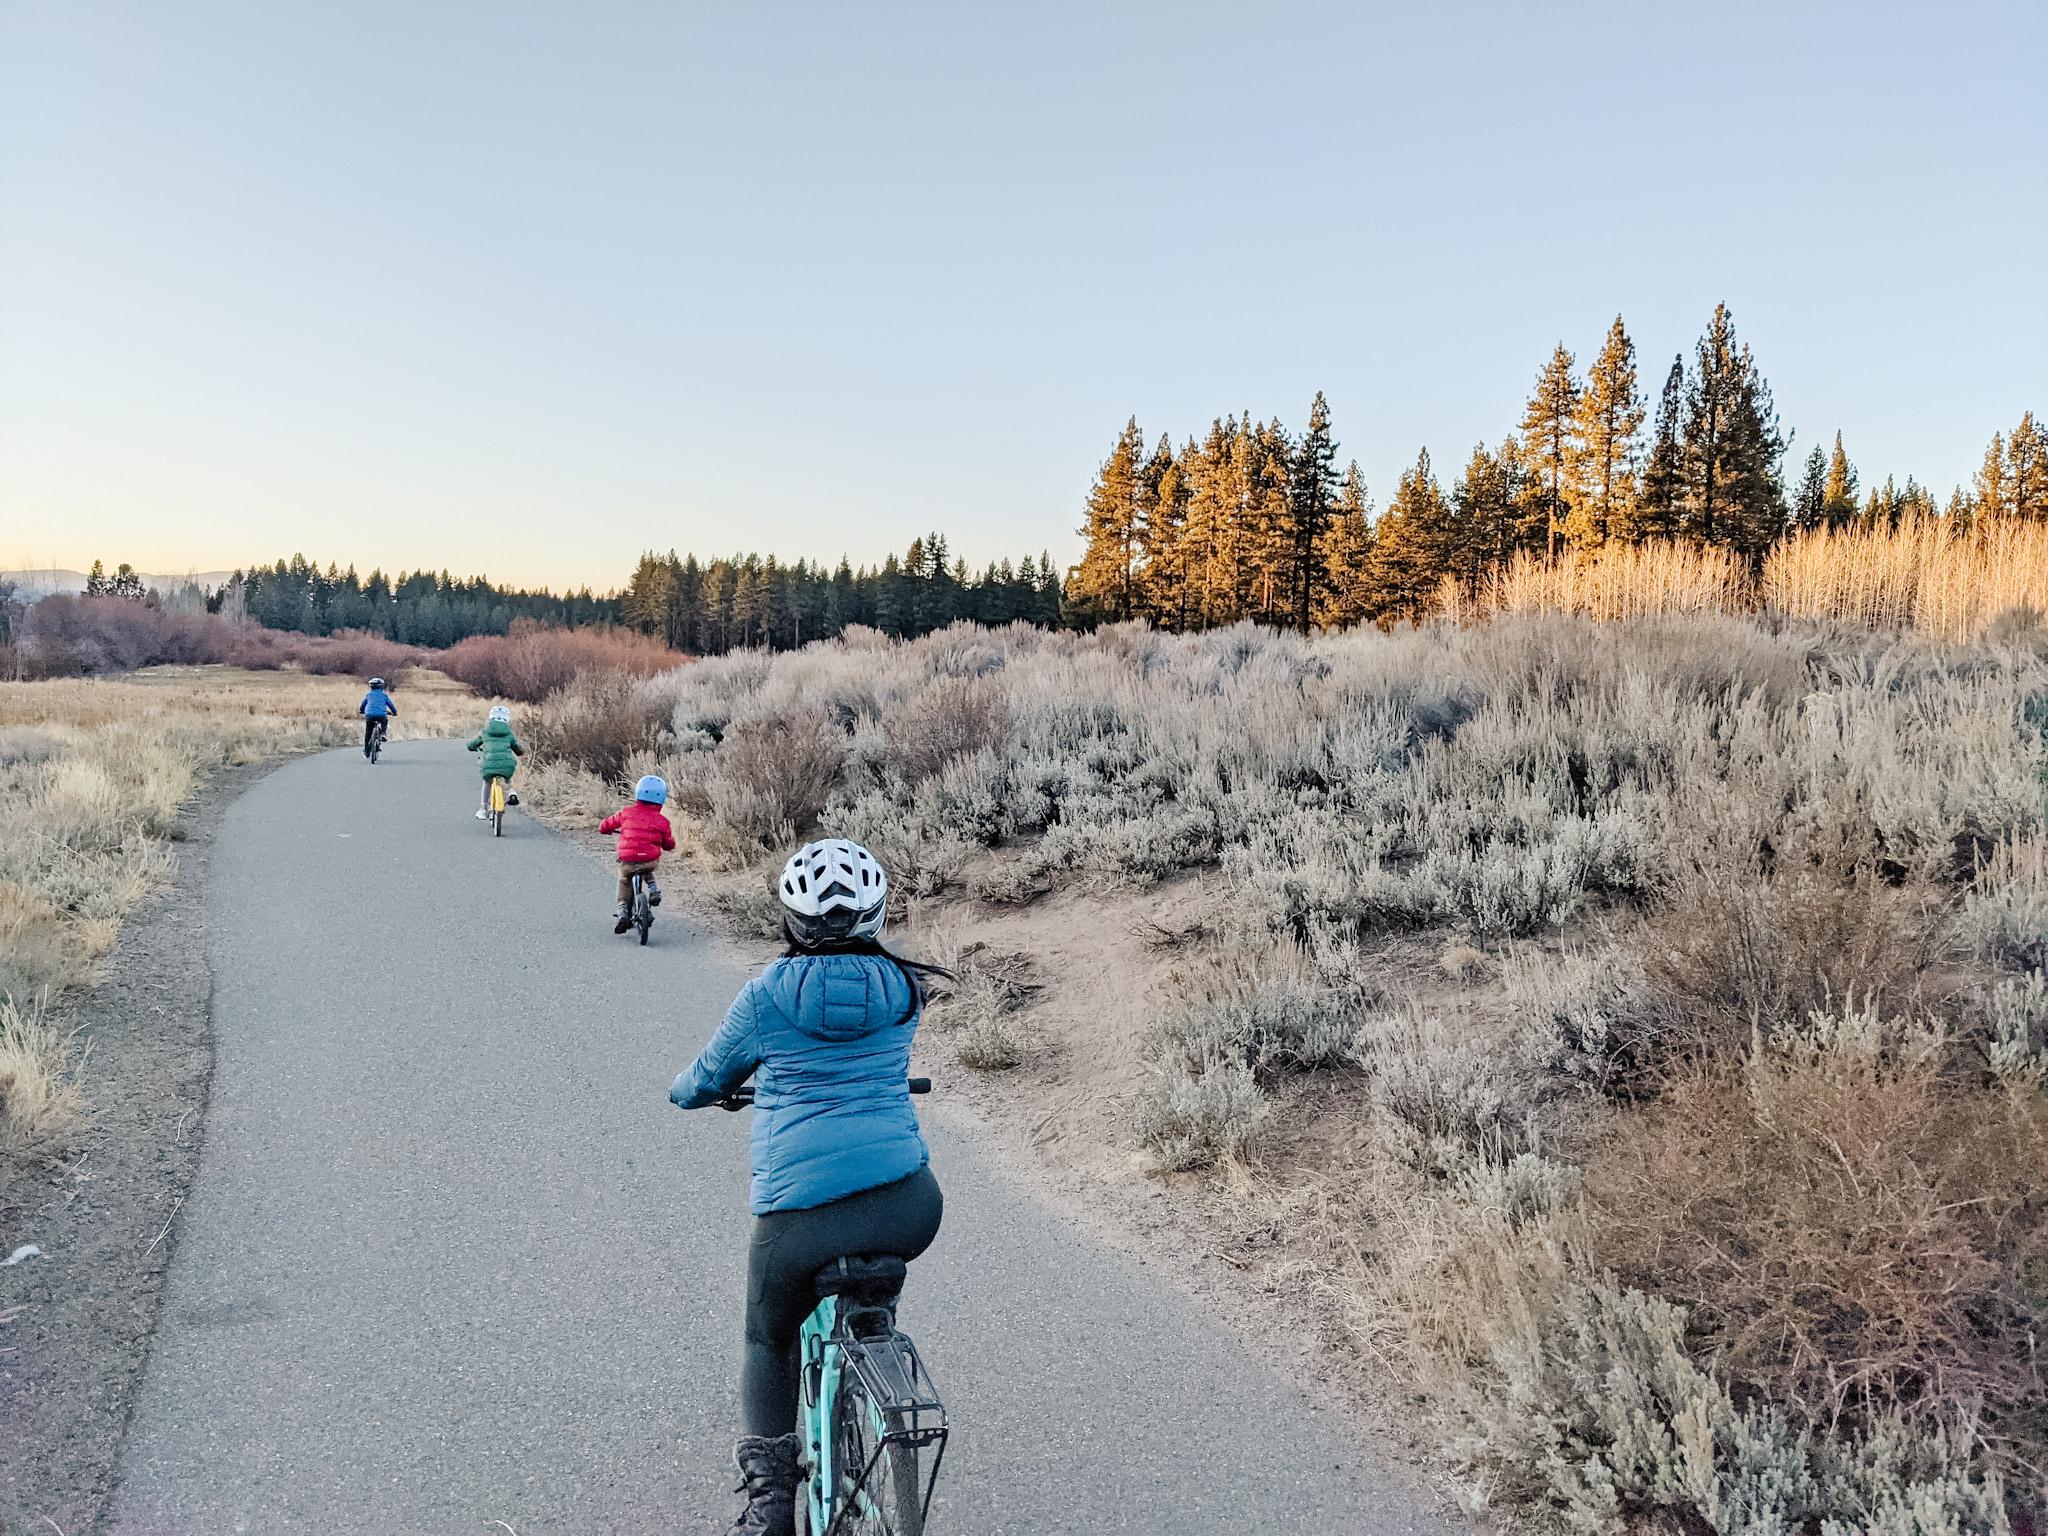 south lake tahoe with kids bike ride